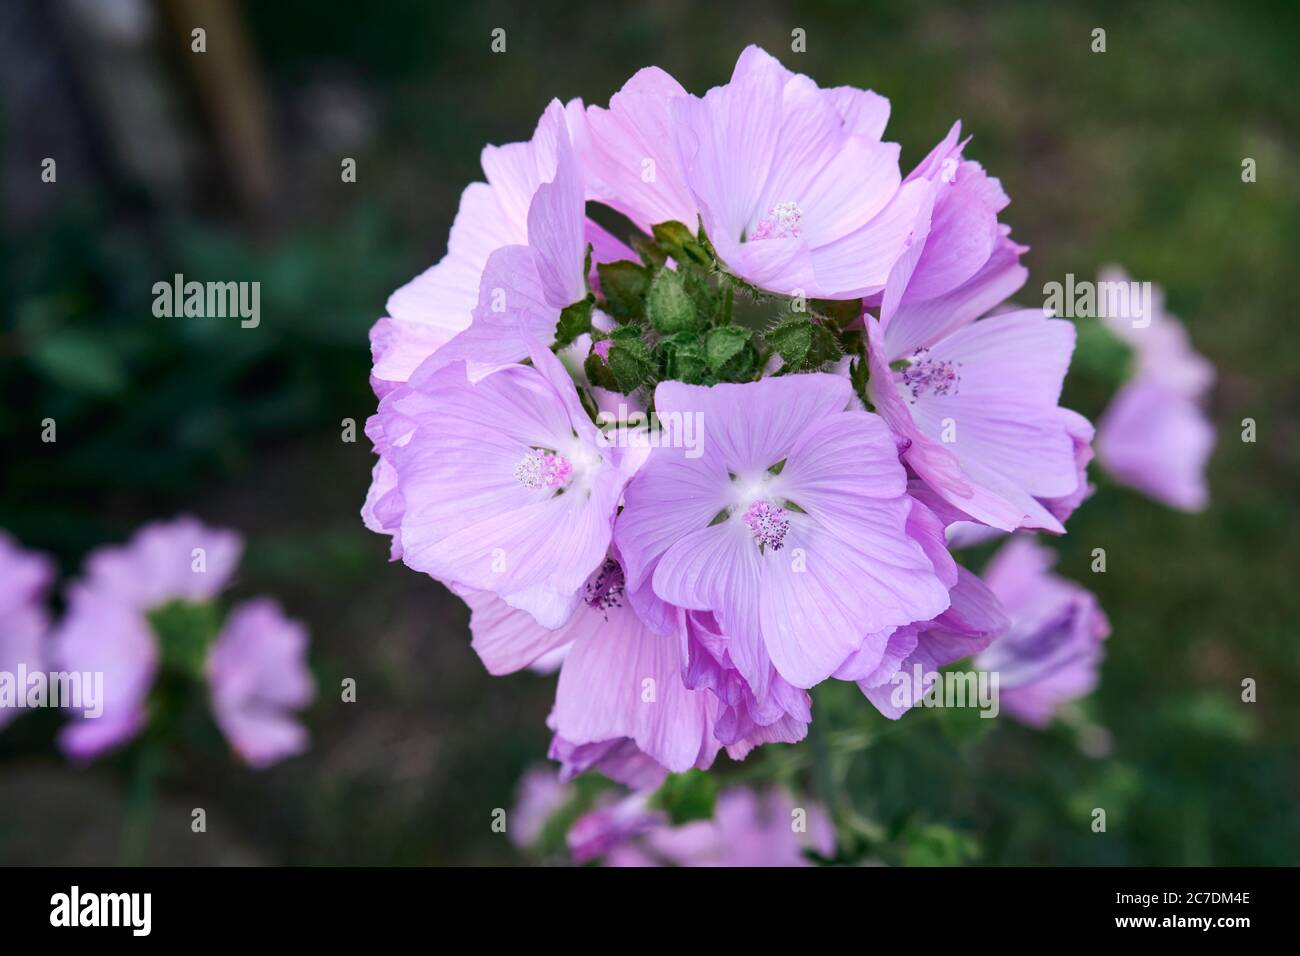 closeuppurple-flower-2C7DM4E.jpg